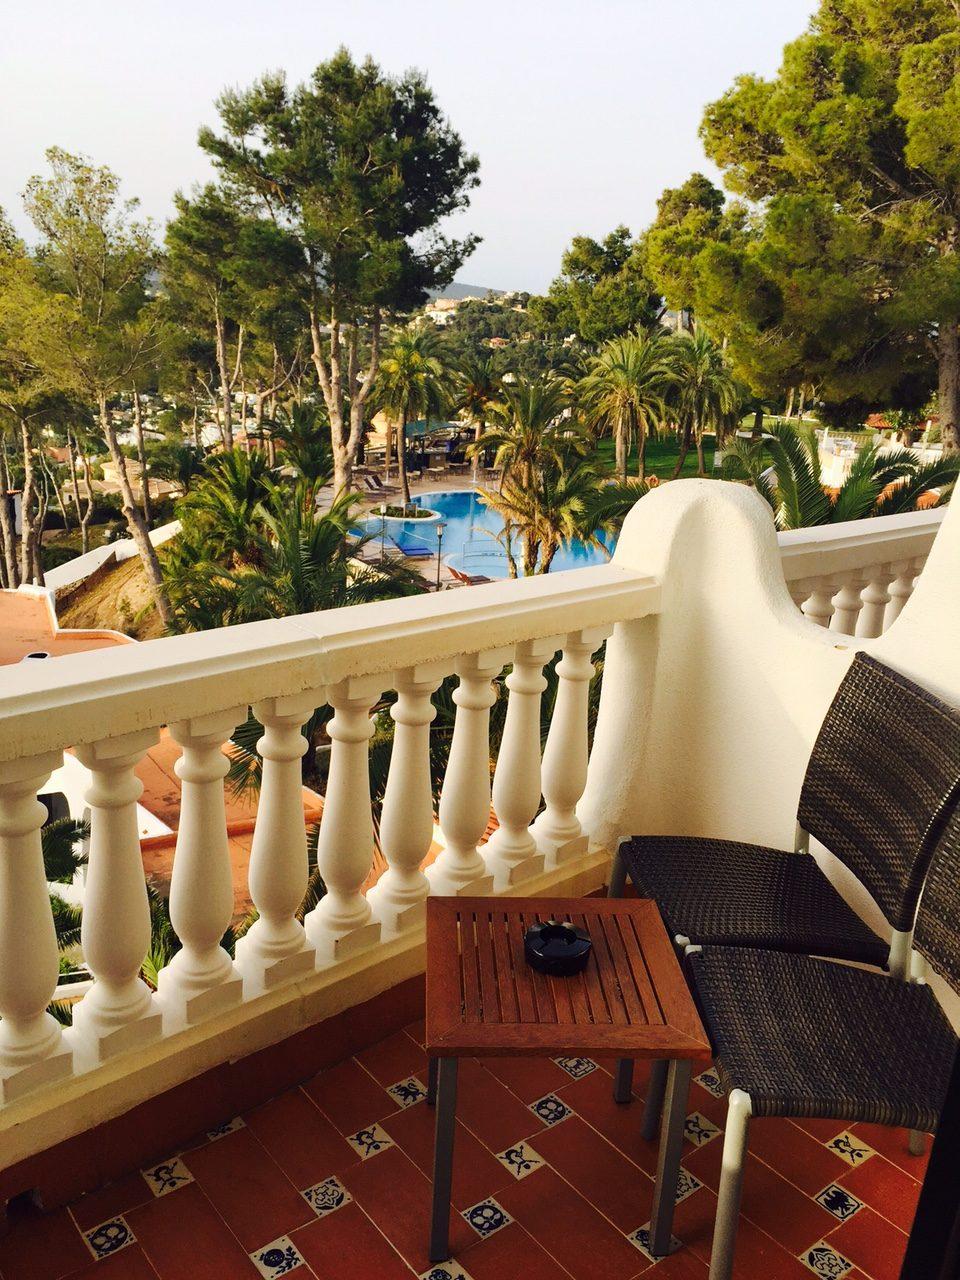 Hotel Maritim hotel Galatzo Getest op Mallorca in Paguero blogger Foodinista